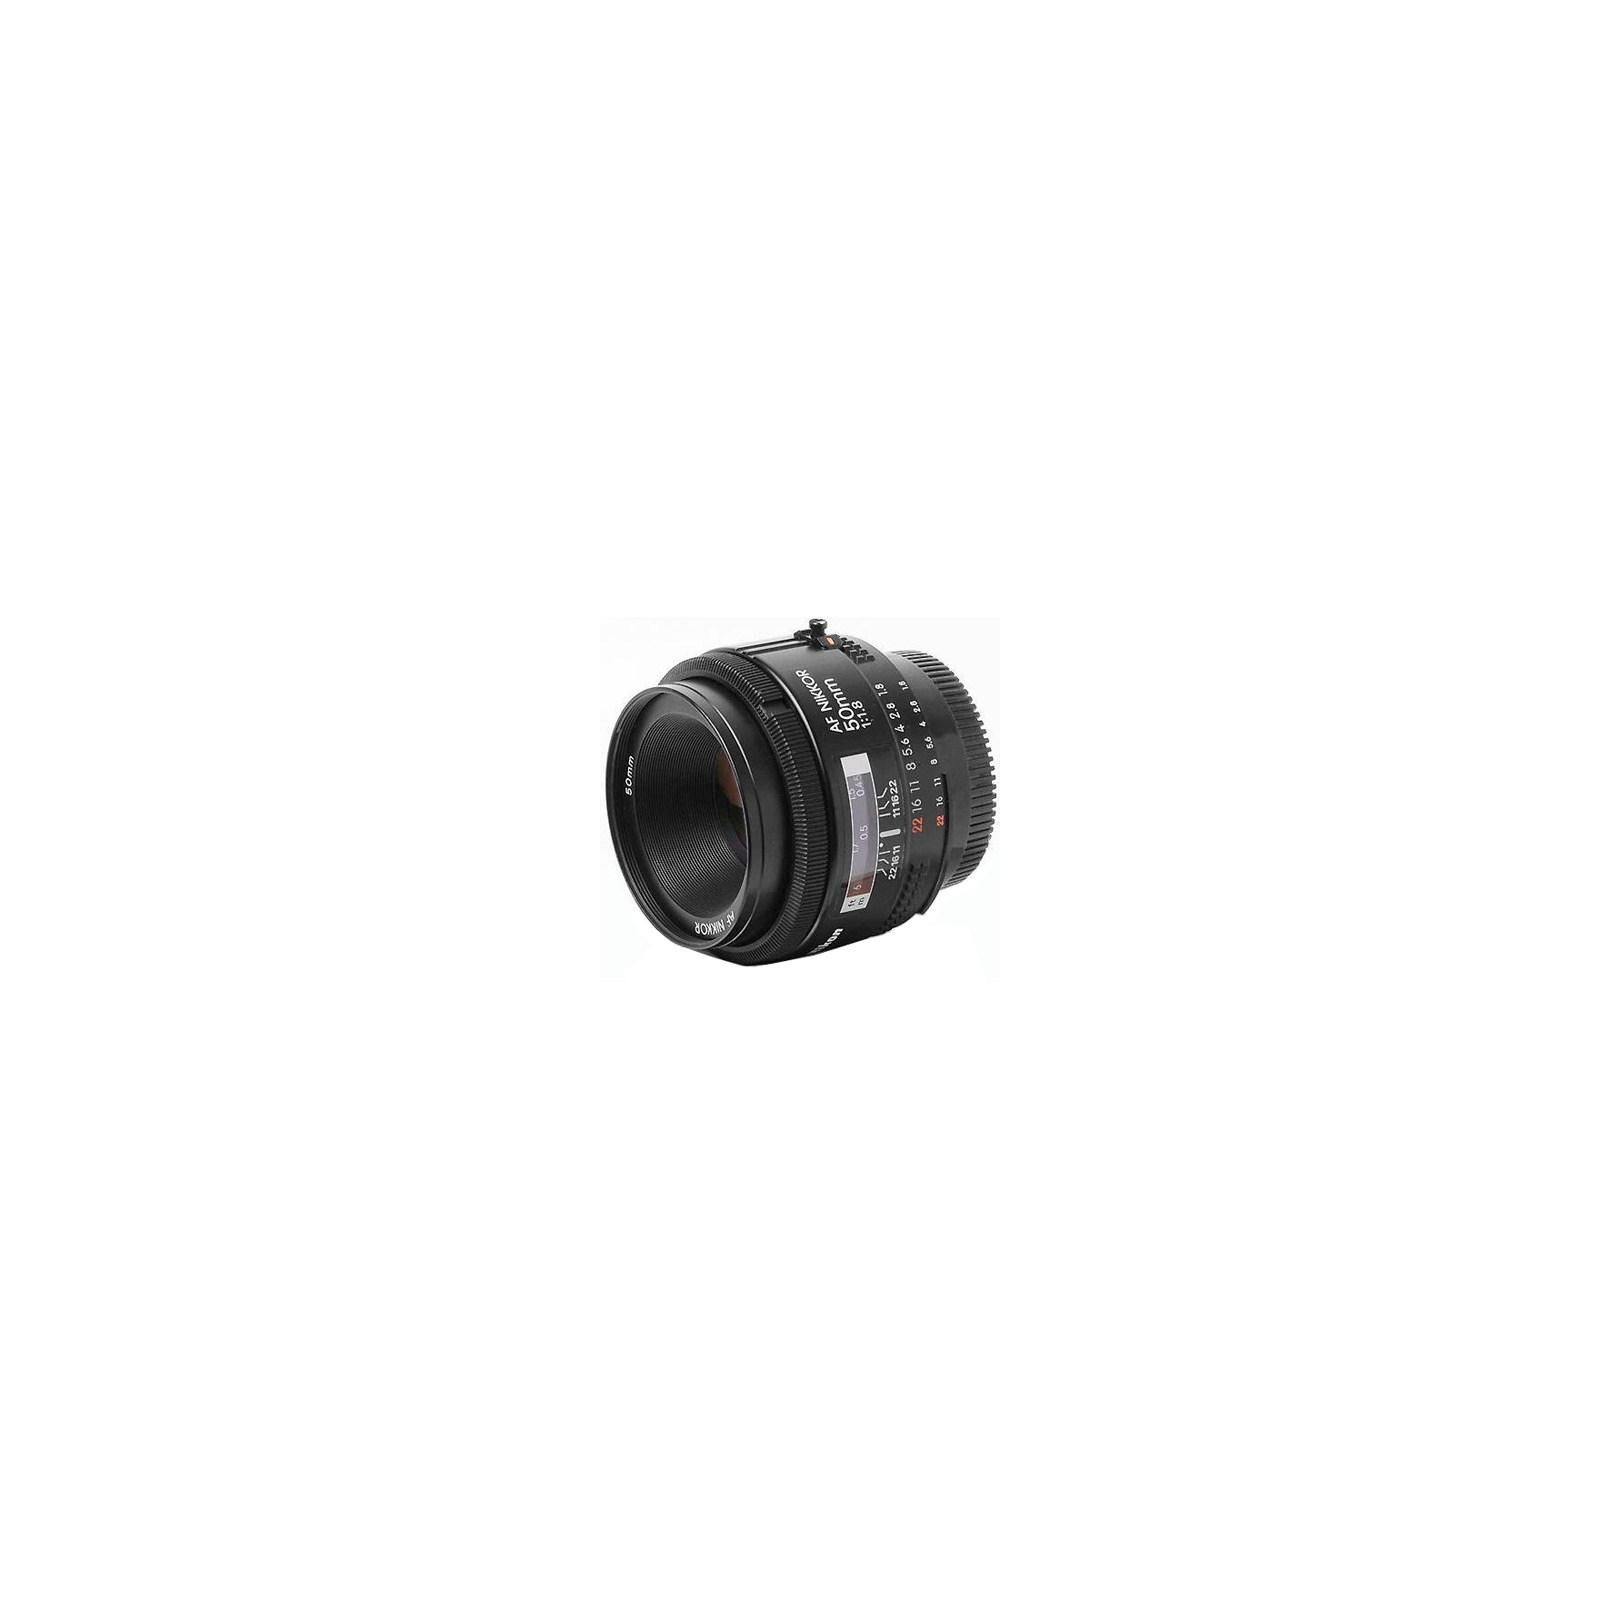 Объектив Nikkor AF 50mm f/1.8D Nikon (JAA013DA) изображение 2